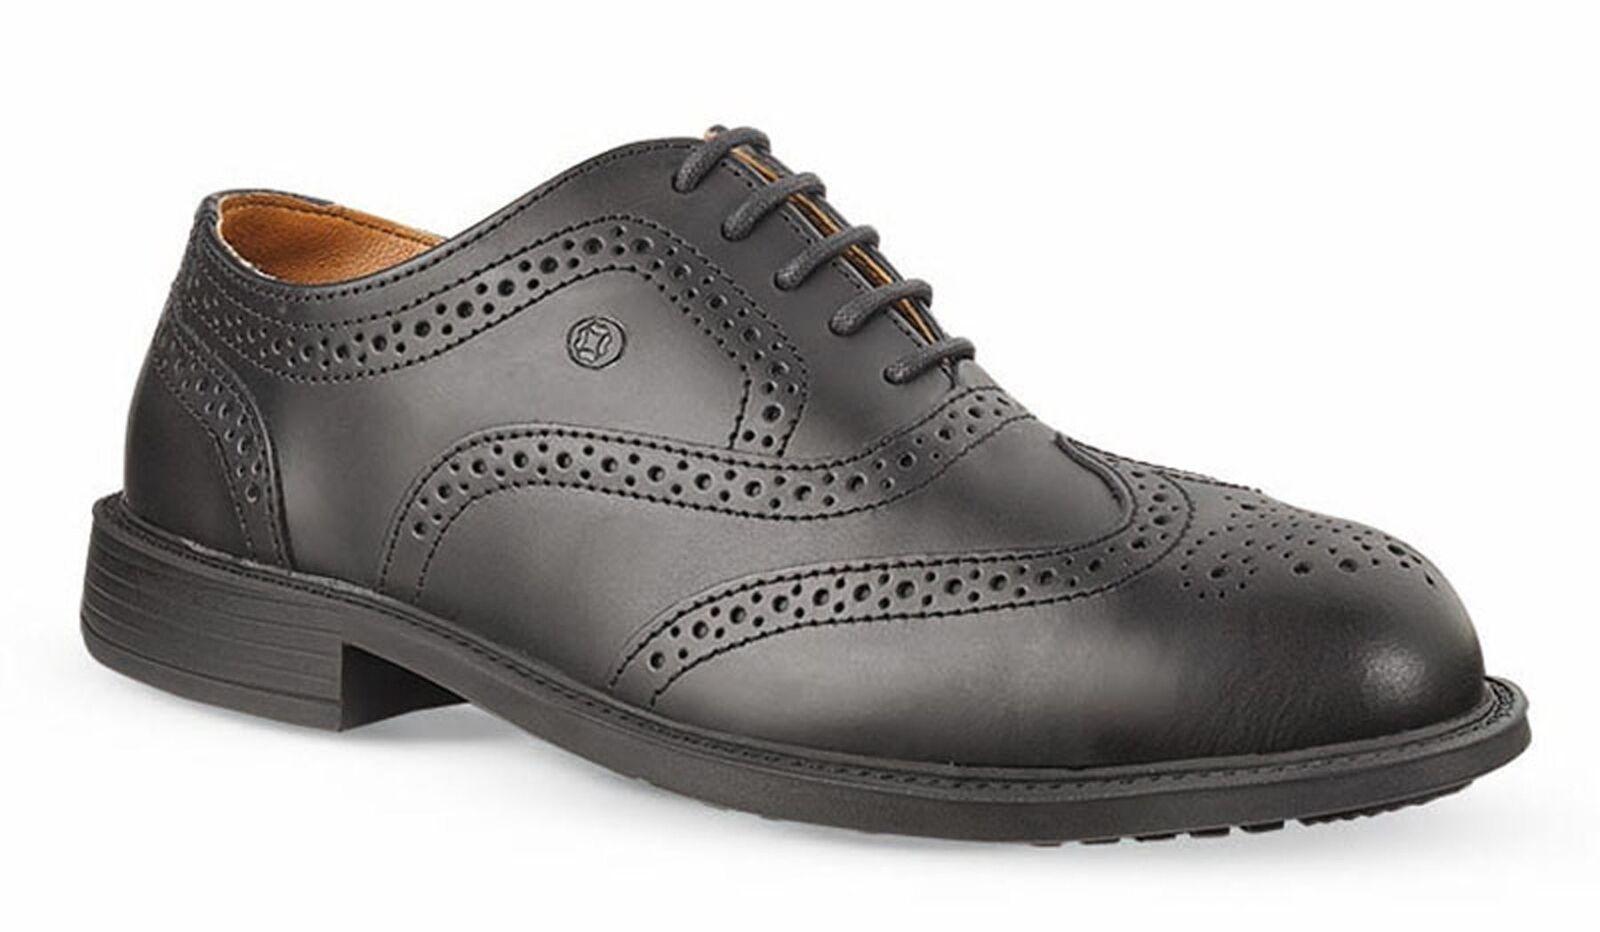 Jallatte Jaloscar JDR01 Mens Black Leather Safety Toecap Brogue Shoes Lace Up